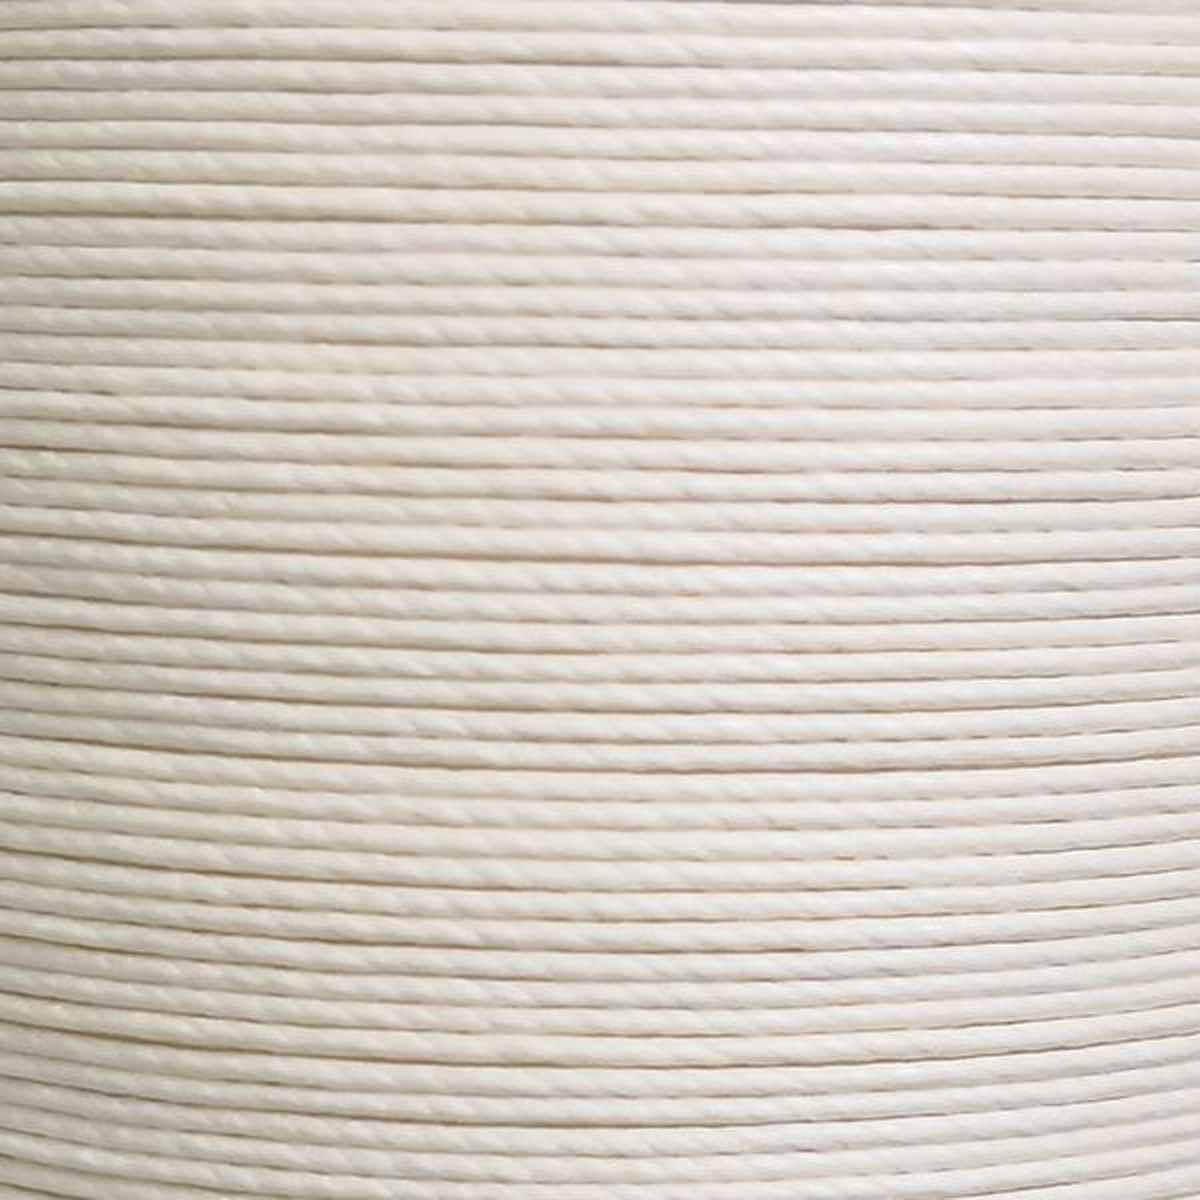 Bobine de 25m de fil de lin ciré MeiSi M90 - 0,9 mm - ÉCRU - MS101